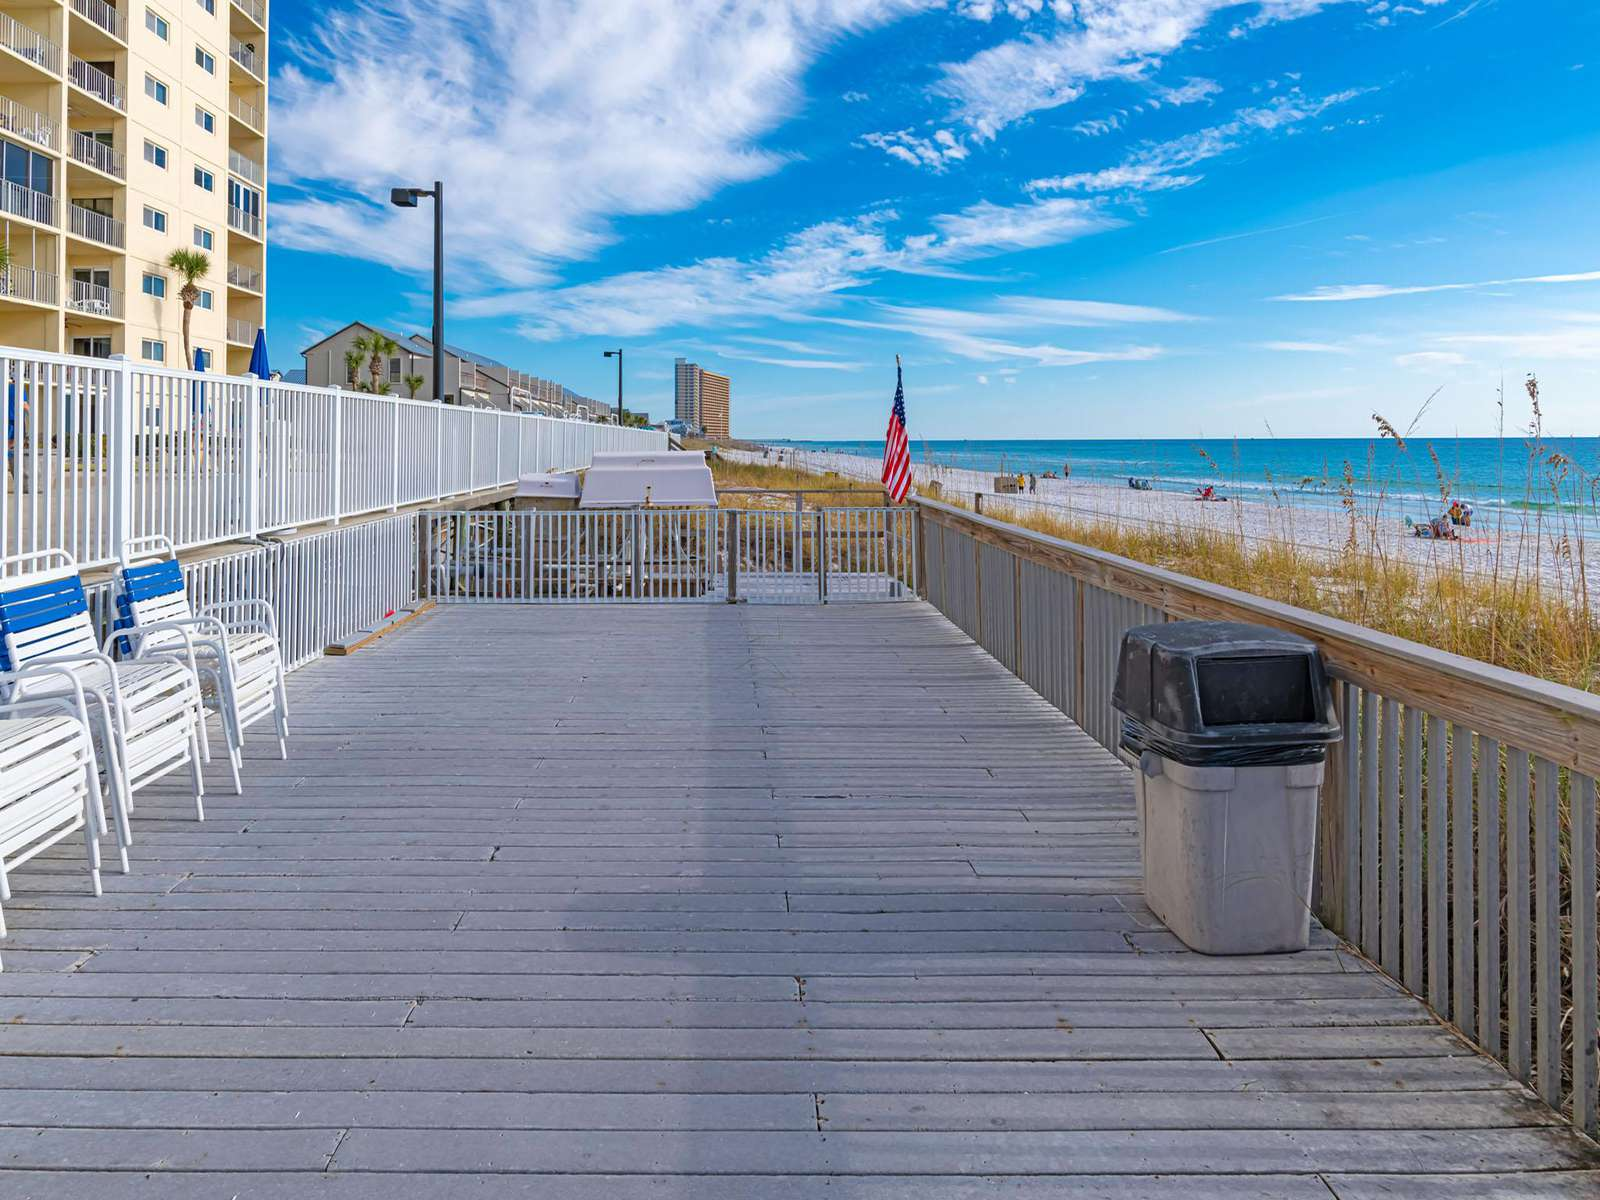 Take a stroll down the boardwalk!